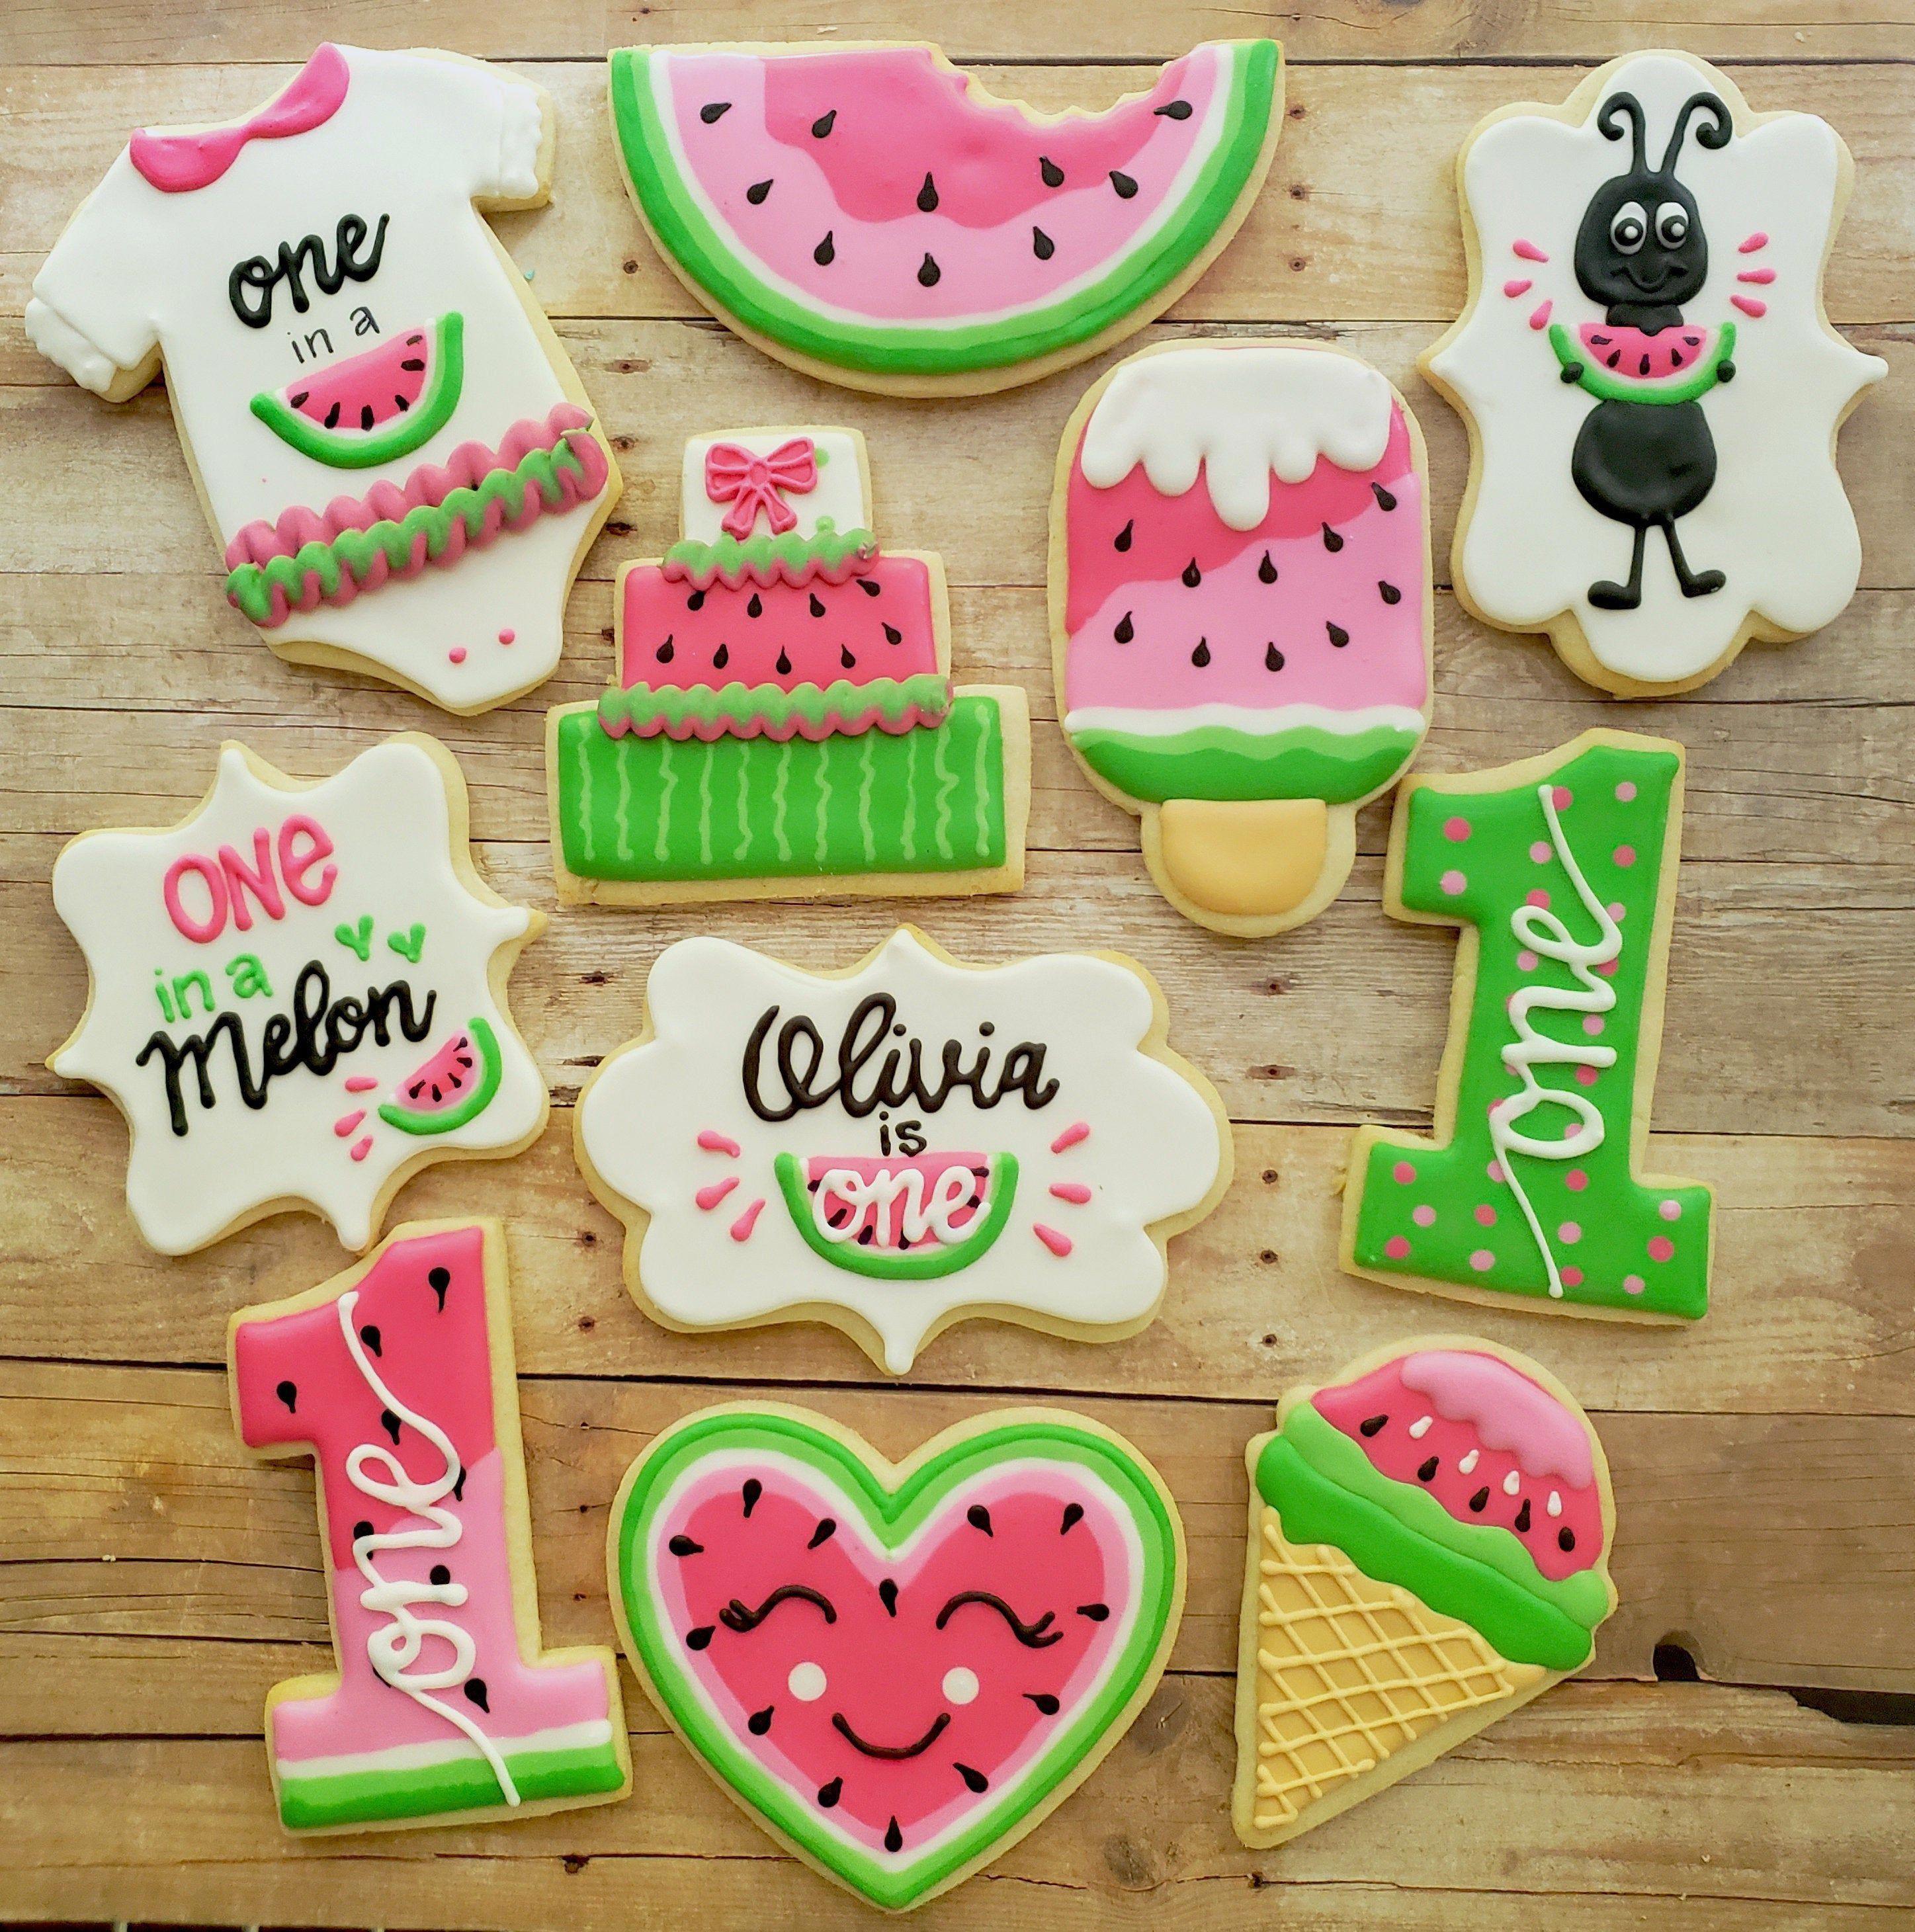 12 Watermelon Themed Sugar Cookies - First Birthday Watermelon Theme - One in a Melon favors - First Birthday Sugar Cookies